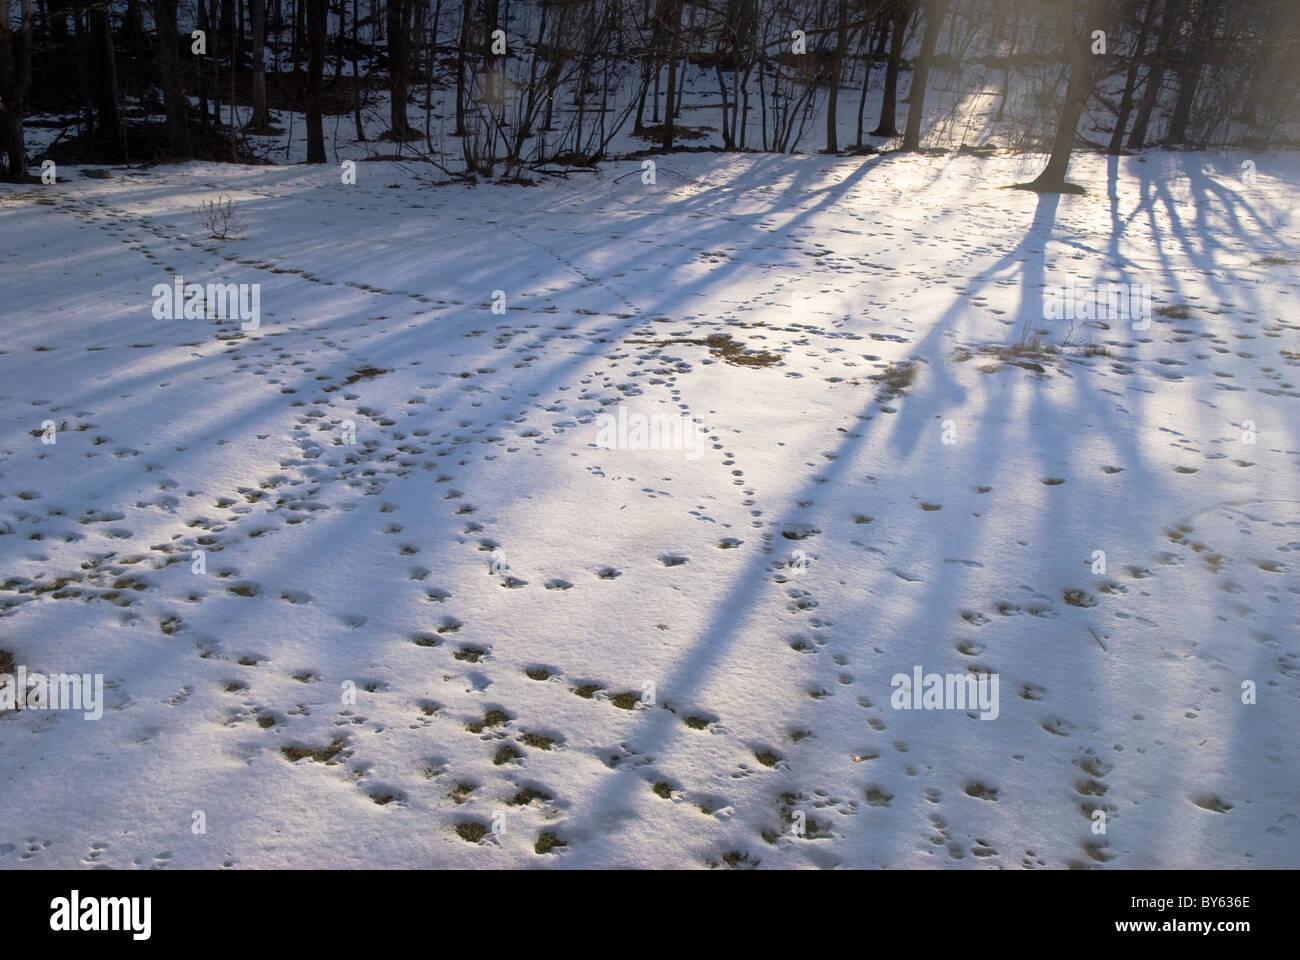 various animal footprints in snow Stock Photo